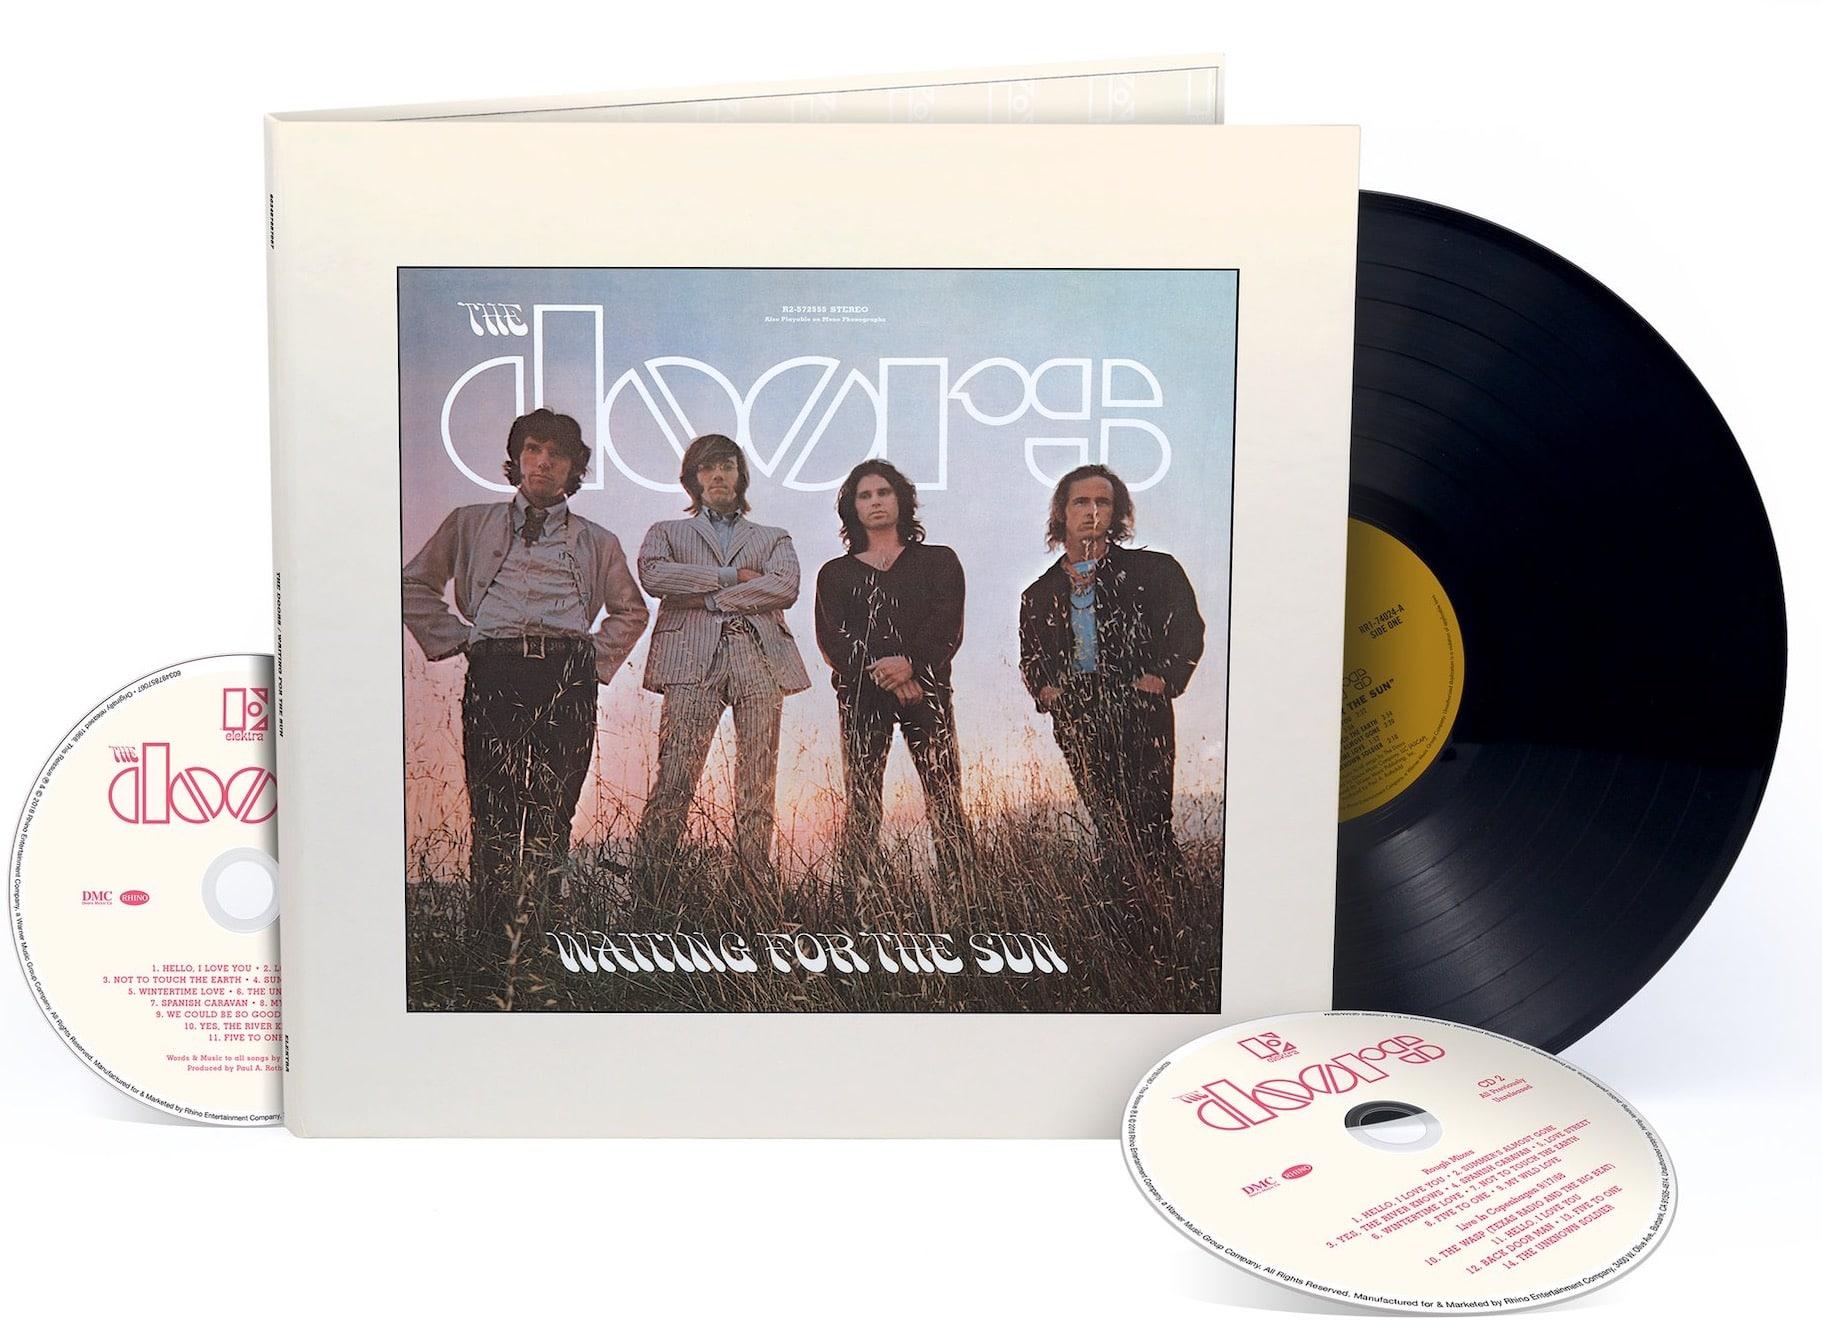 VINYL RELEASES: The Doors, Dubstar & Tubby Hayes